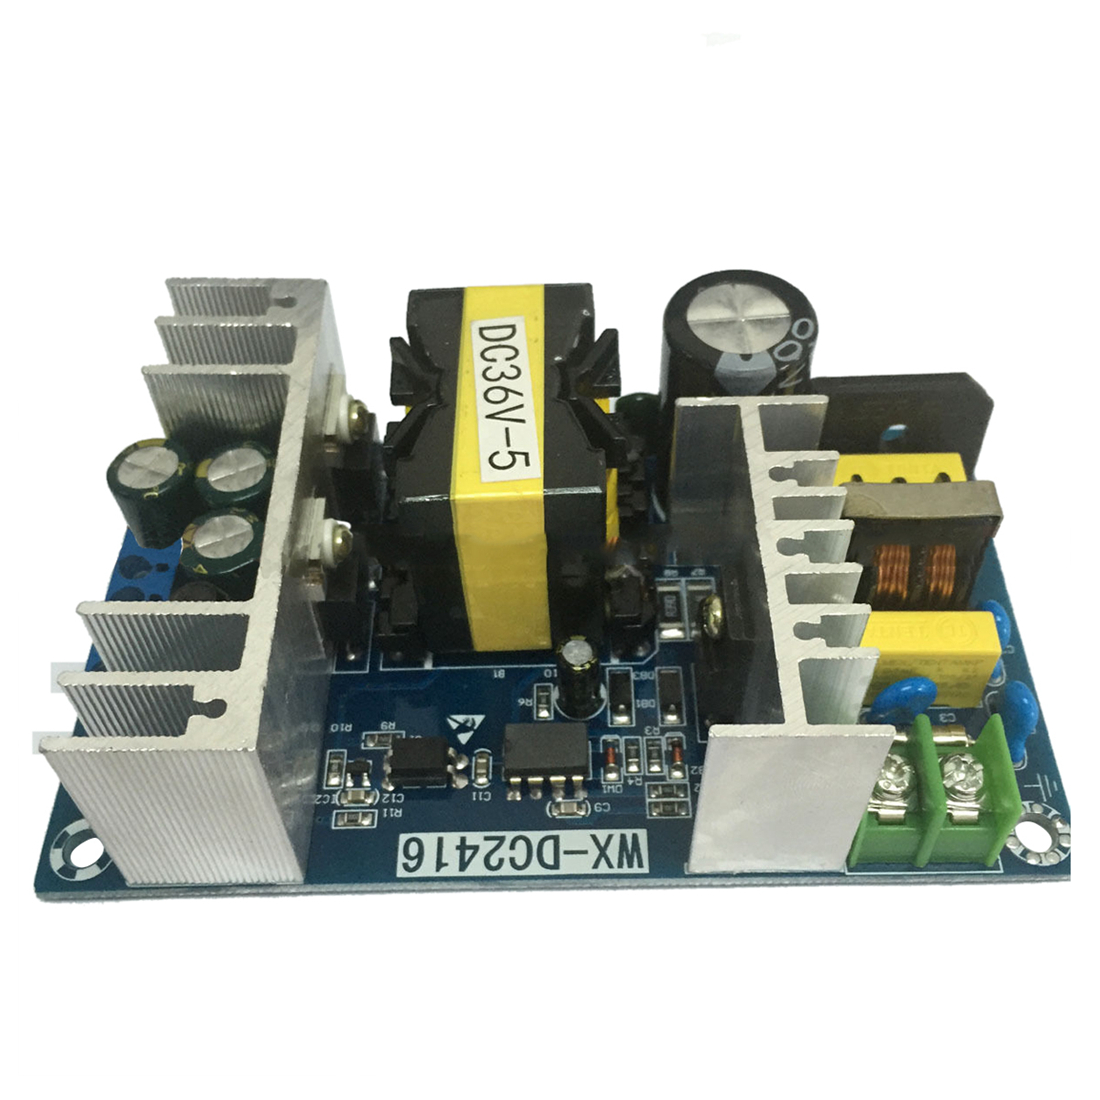 AC-DC Inverter Module 110V 220V 100-265V to 36V 5A Adapter Switching Power Supply 1pcs lot sh b17 50w 220v to 110v 110v to 220v